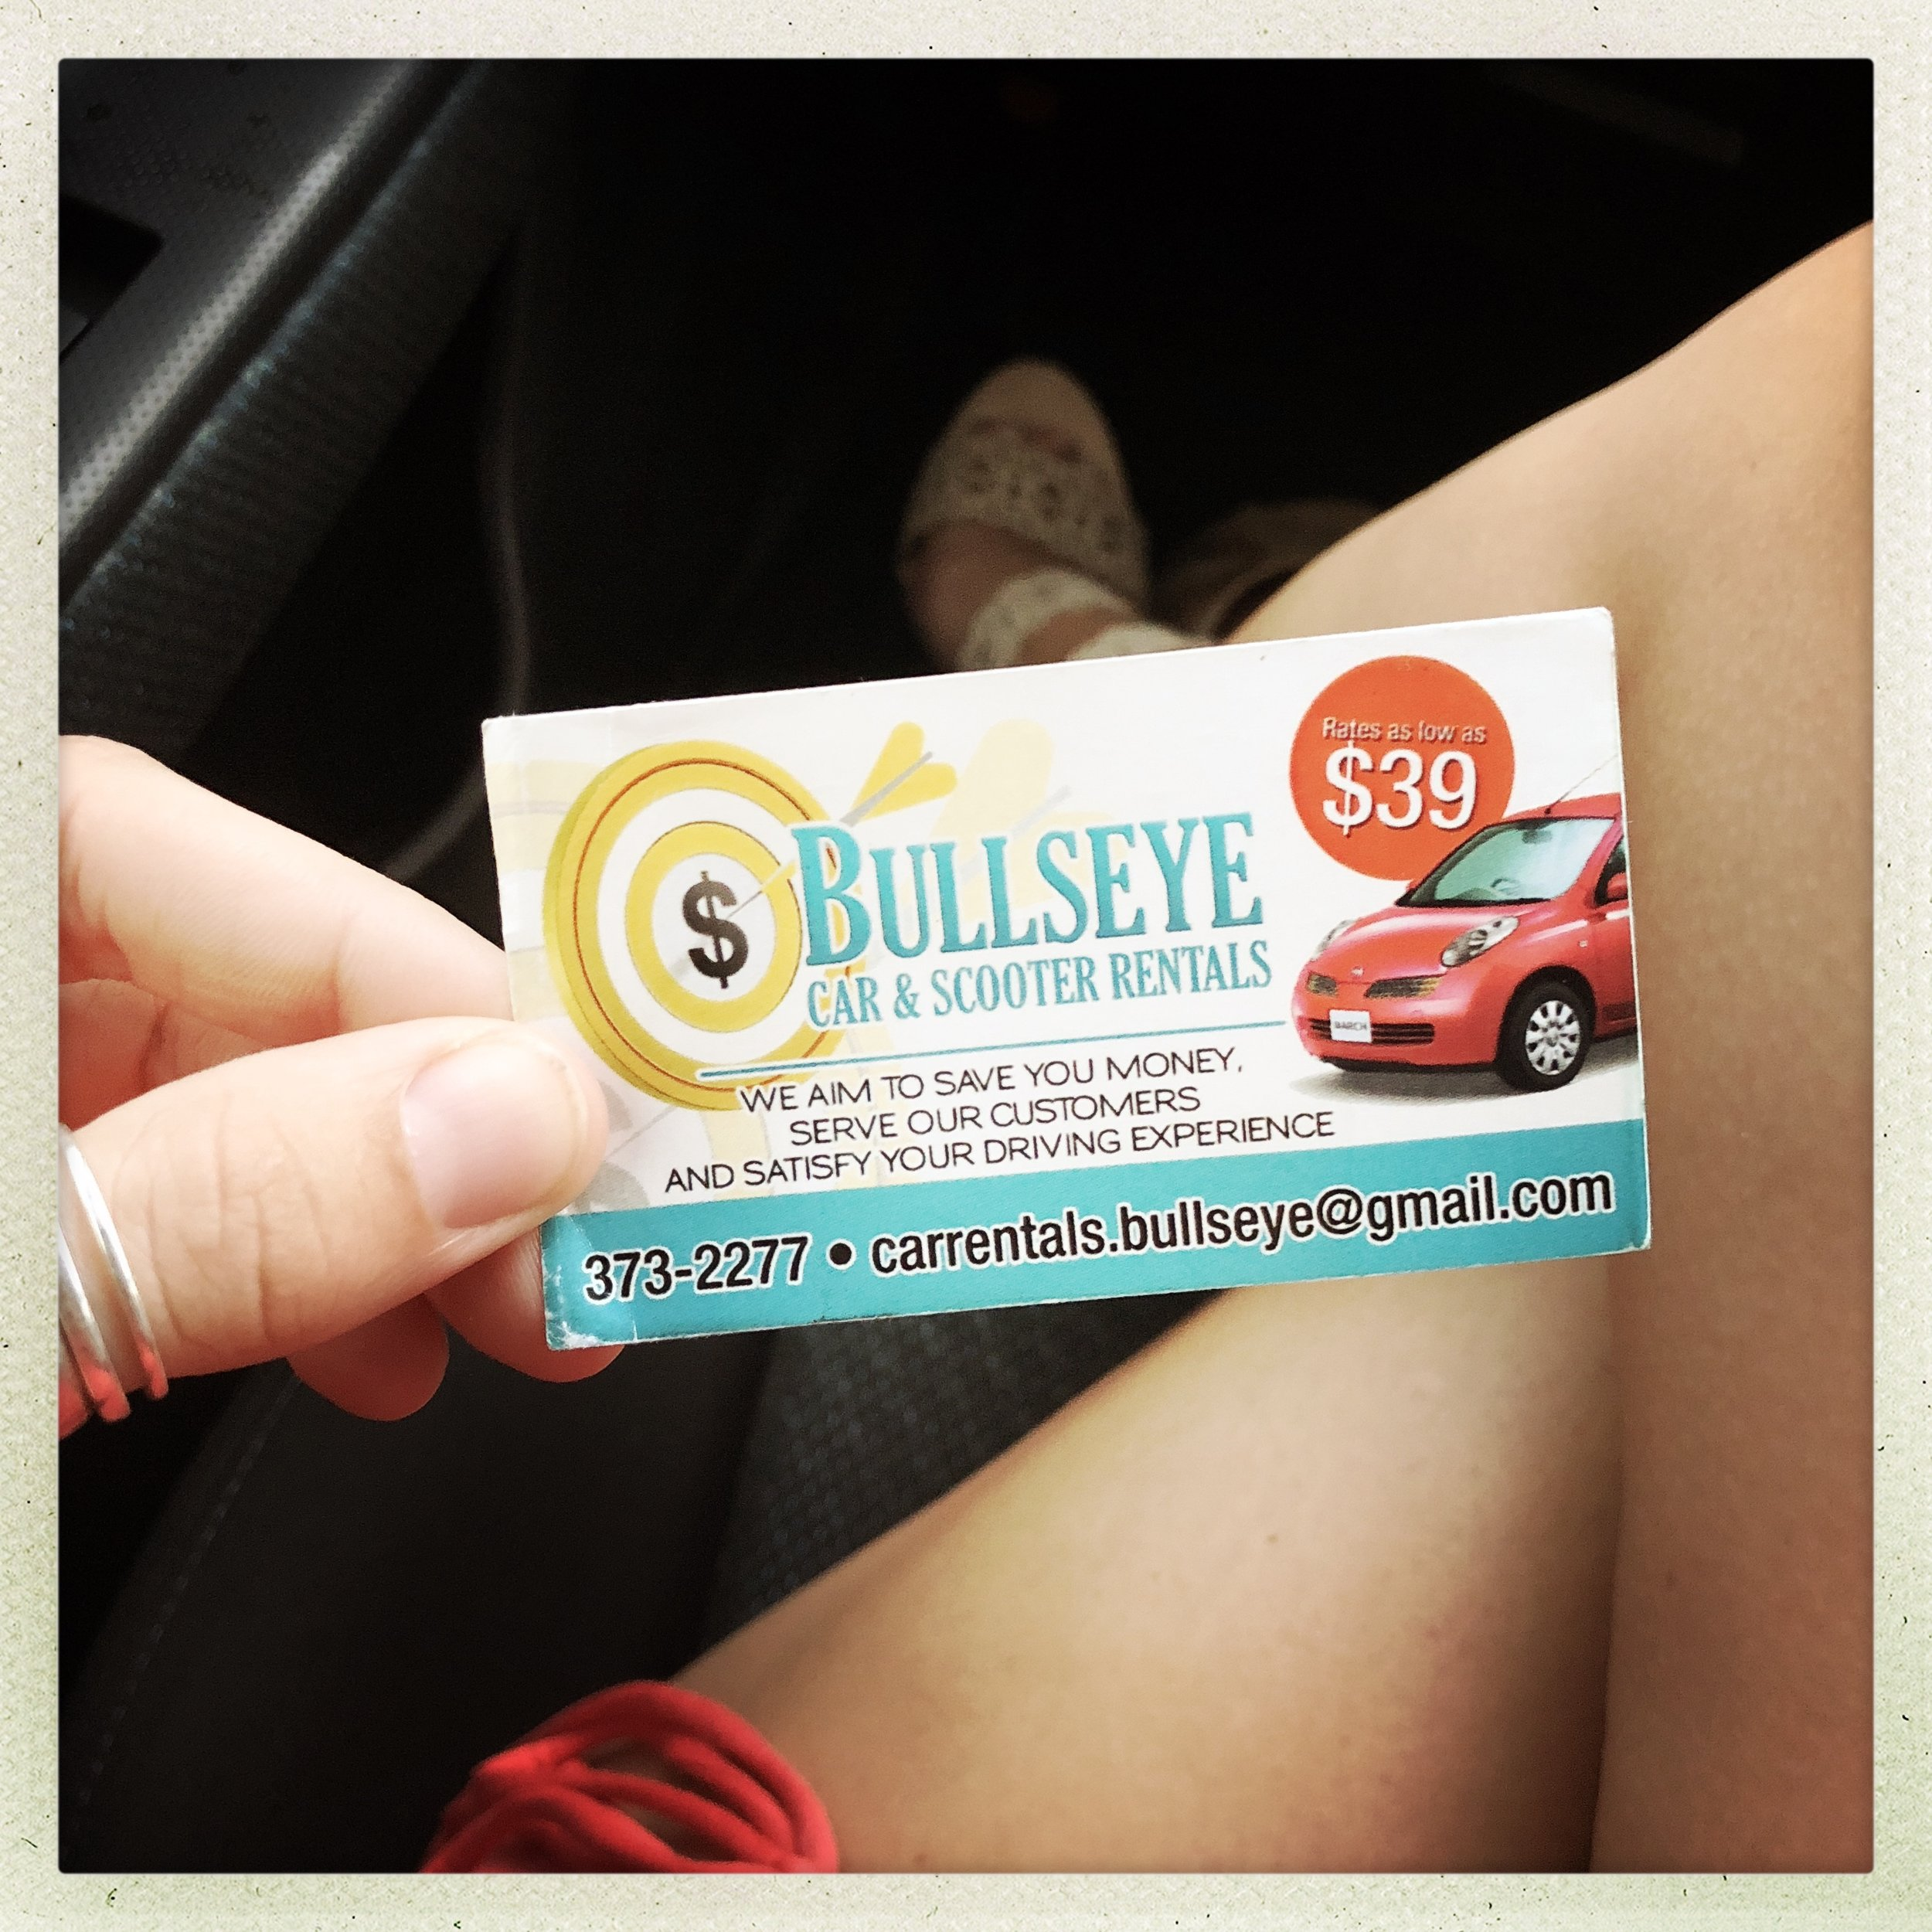 BULLSEYE CAR & SCOOTER RENTAL - GRAND BAHAMA ISLAND242-373-2277carrentals.bullseye@gmail.com